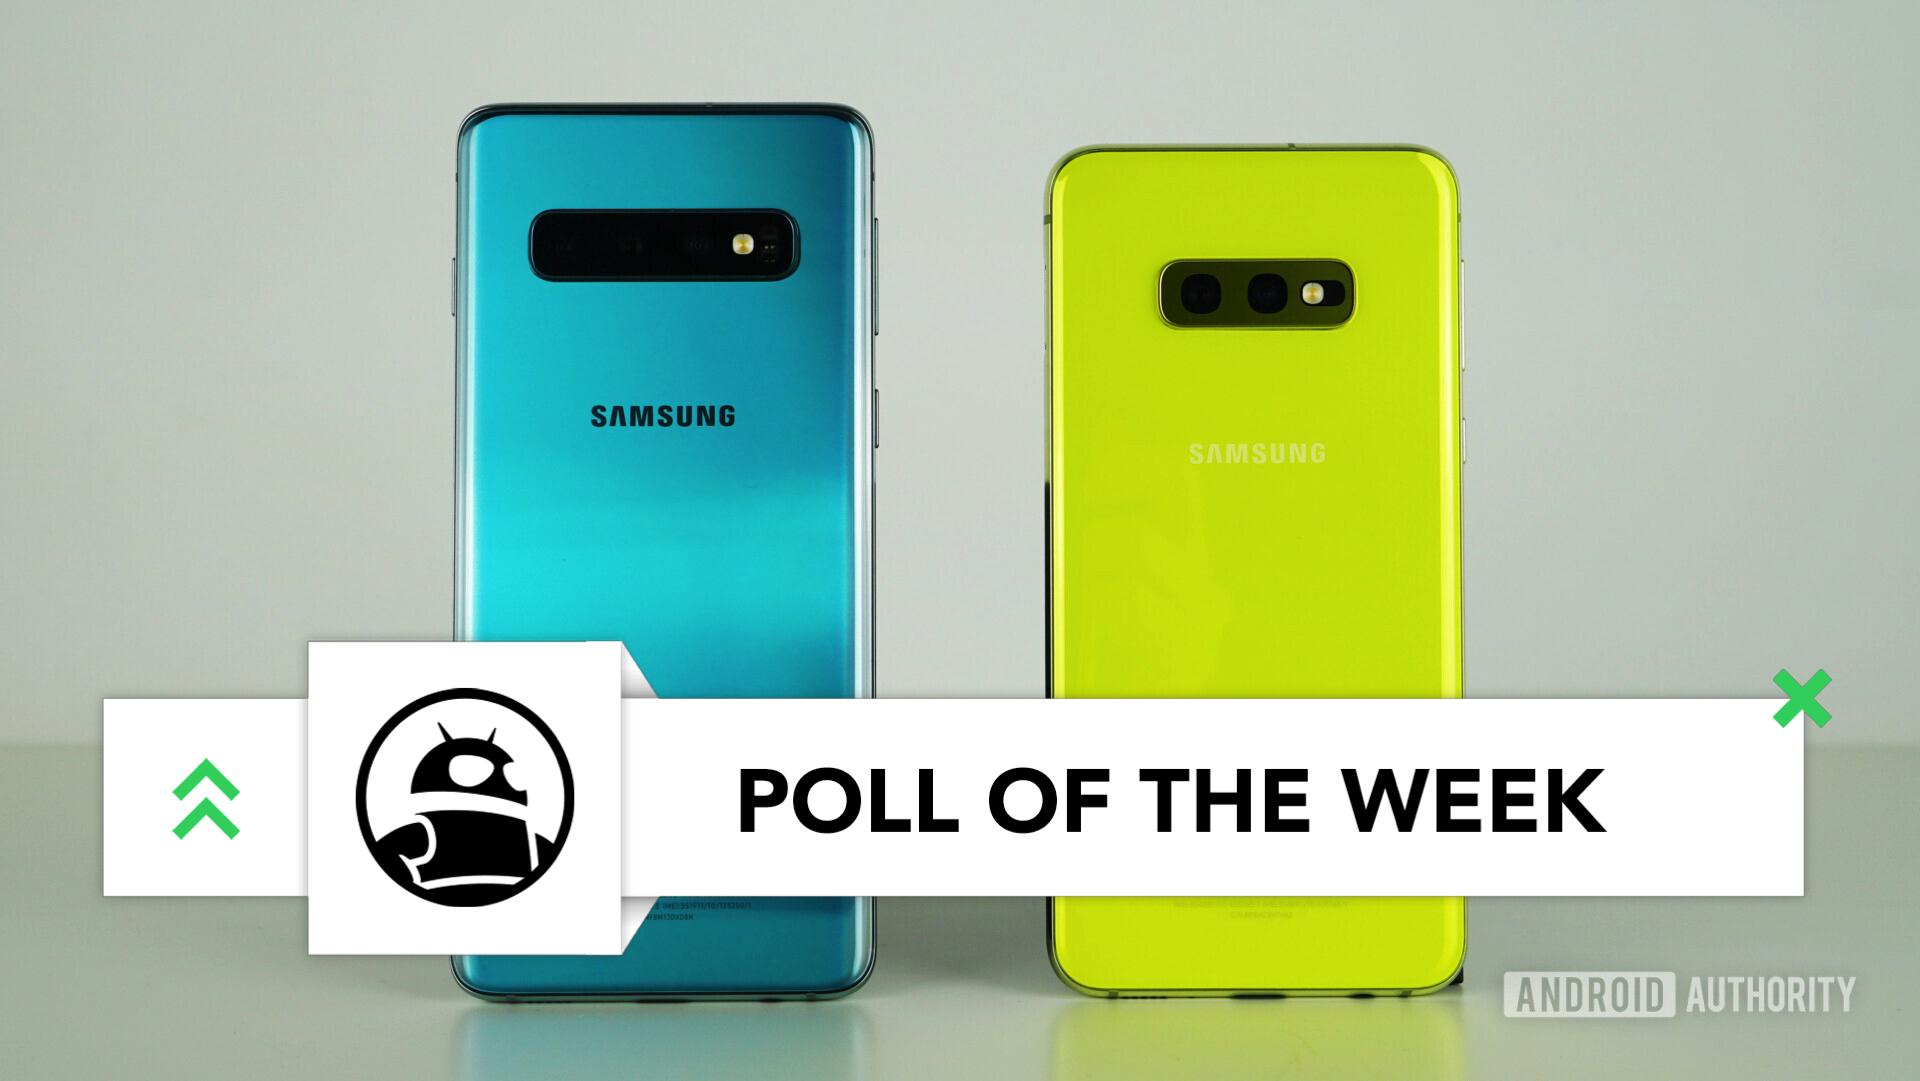 Samsung Galaxy S10 vs Samsung Galaxy S10e back green yellow poll